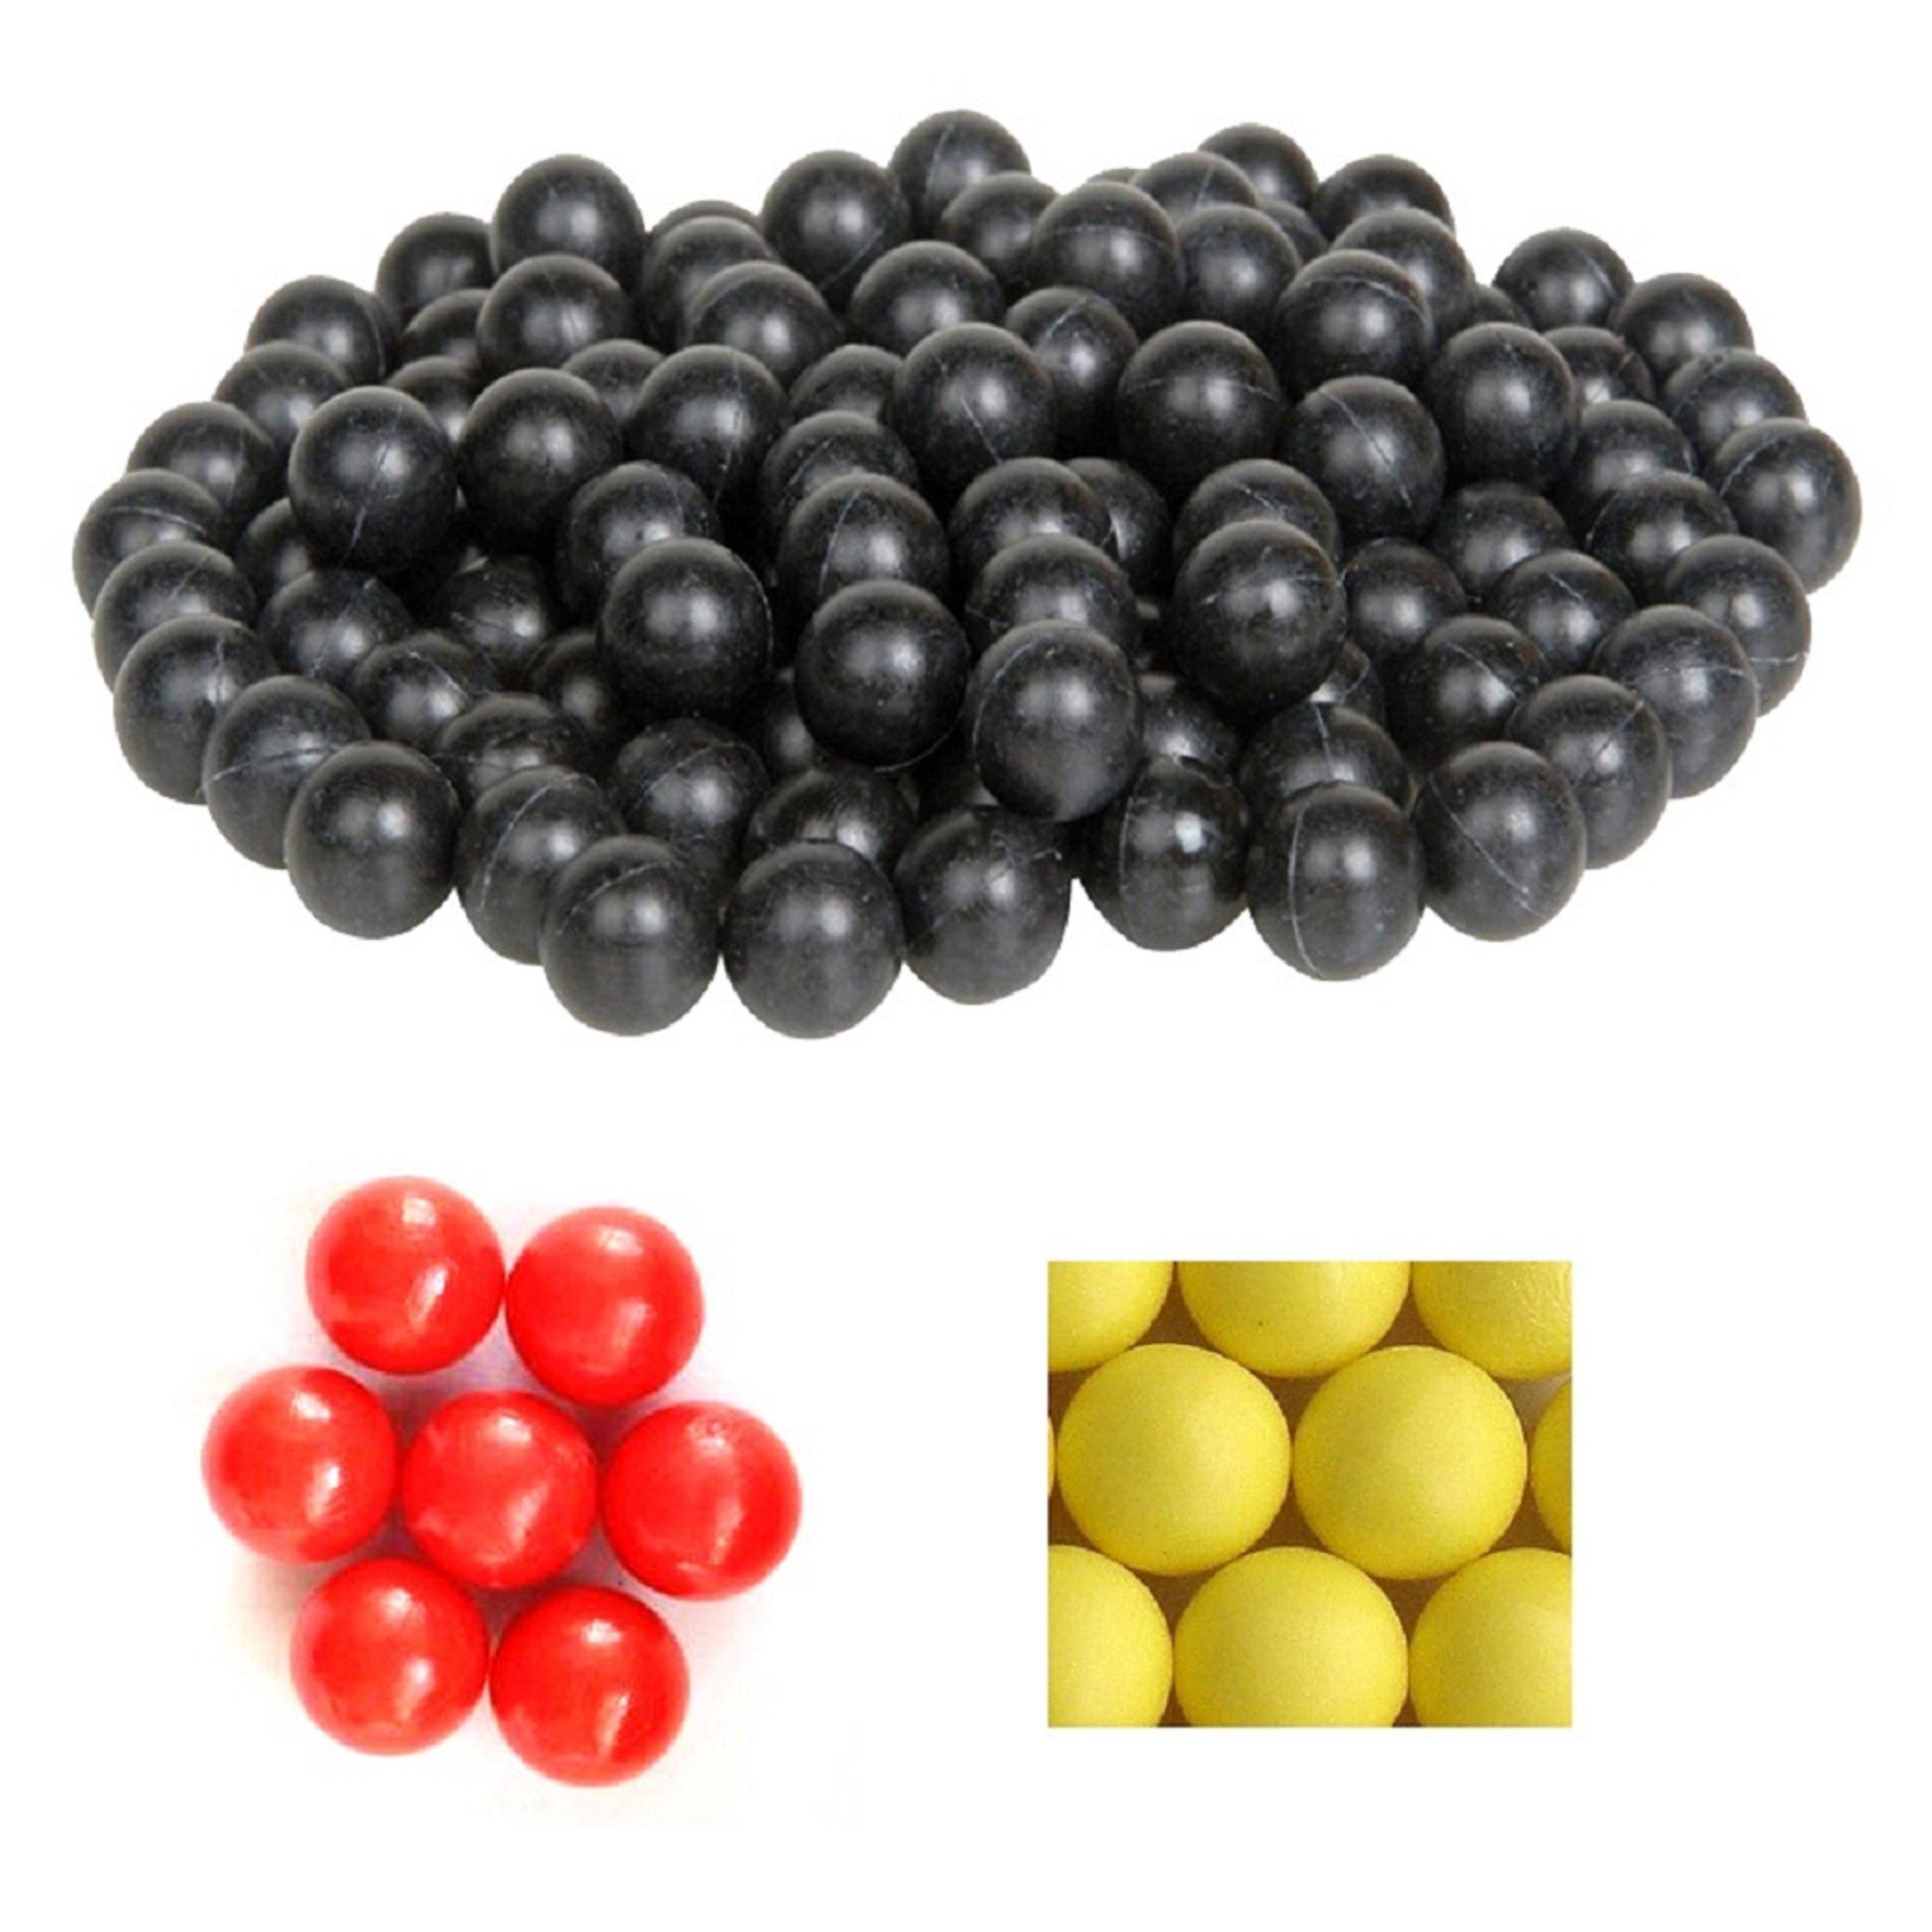 100 X 0.68 Cal. PVC/Nylon Riot Balls Self Defense Less Lethal Practice Paintball